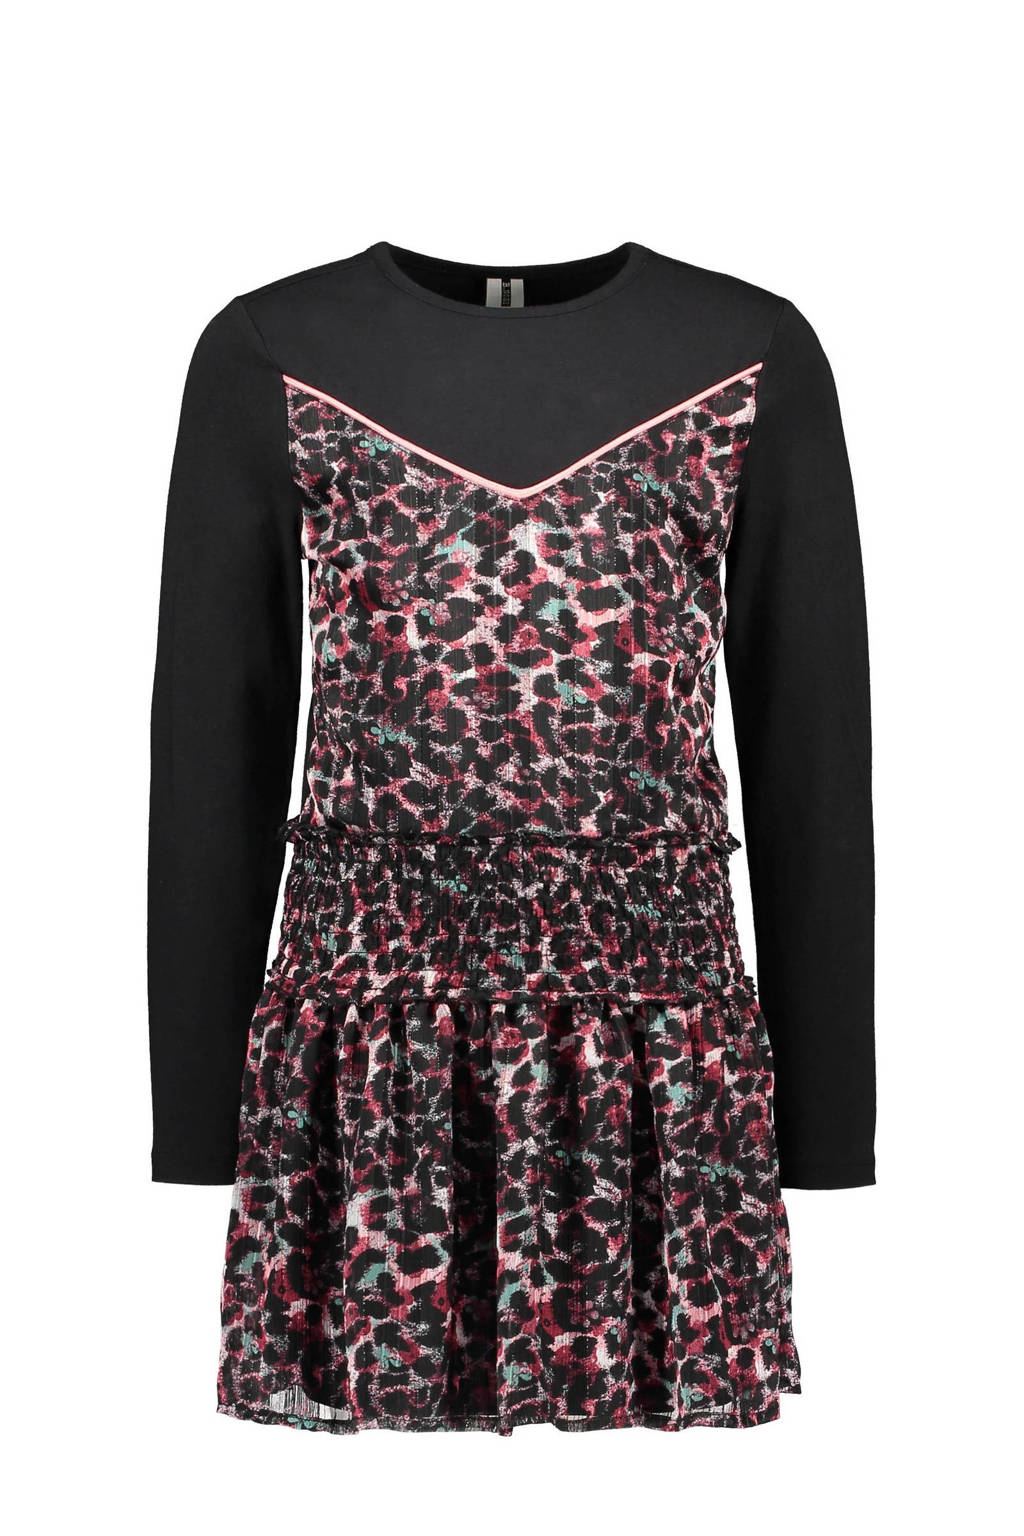 B.Nosy jurk met all over print roze/zwart, Roze/zwart